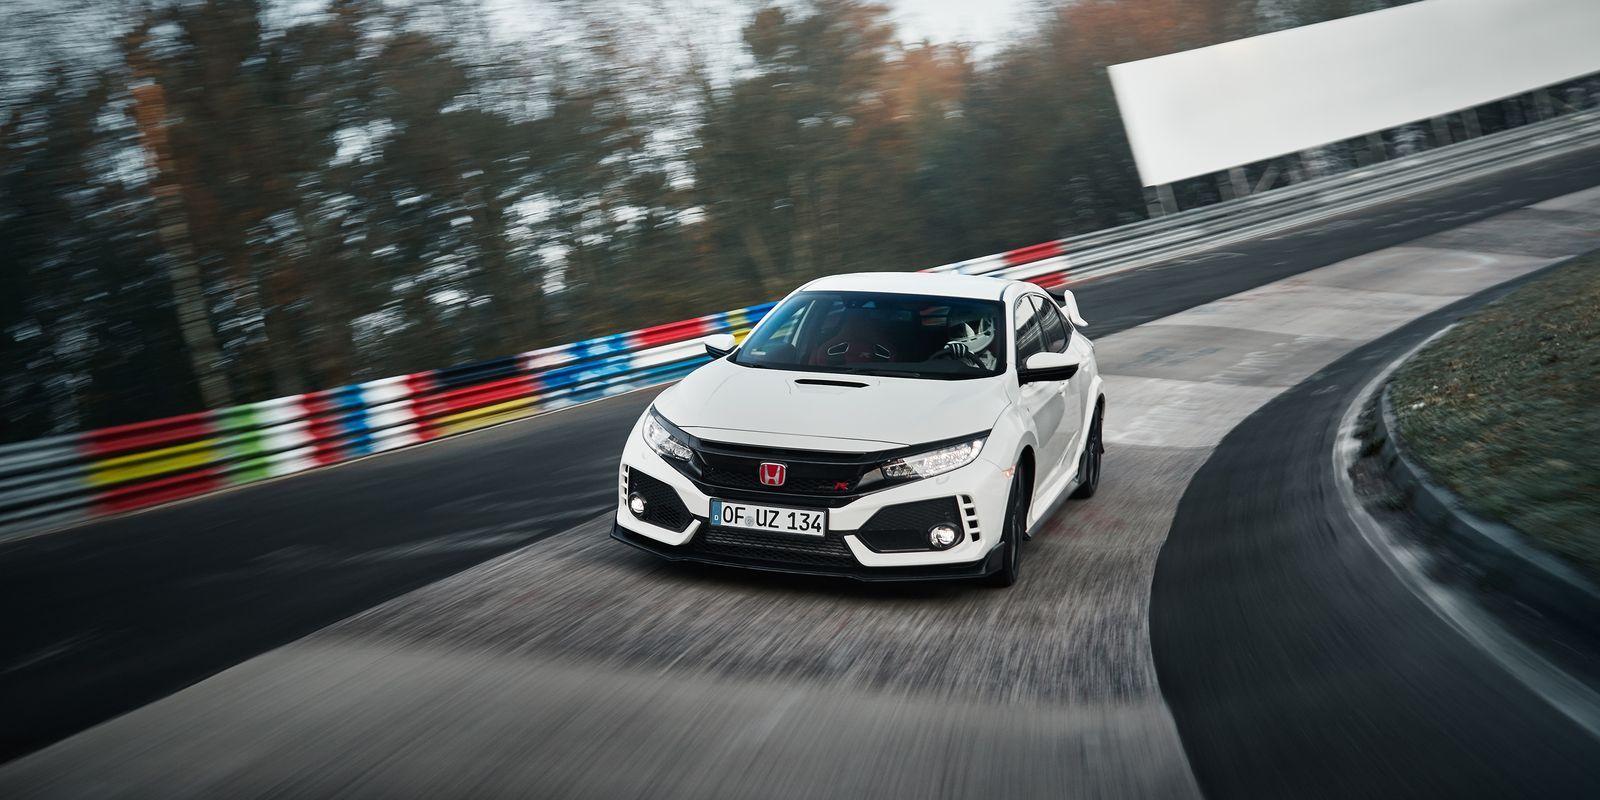 The 20 Greatest Front Wheel Drive Track Cars You Can Buy Honda Civic Type R Honda Civic Honda